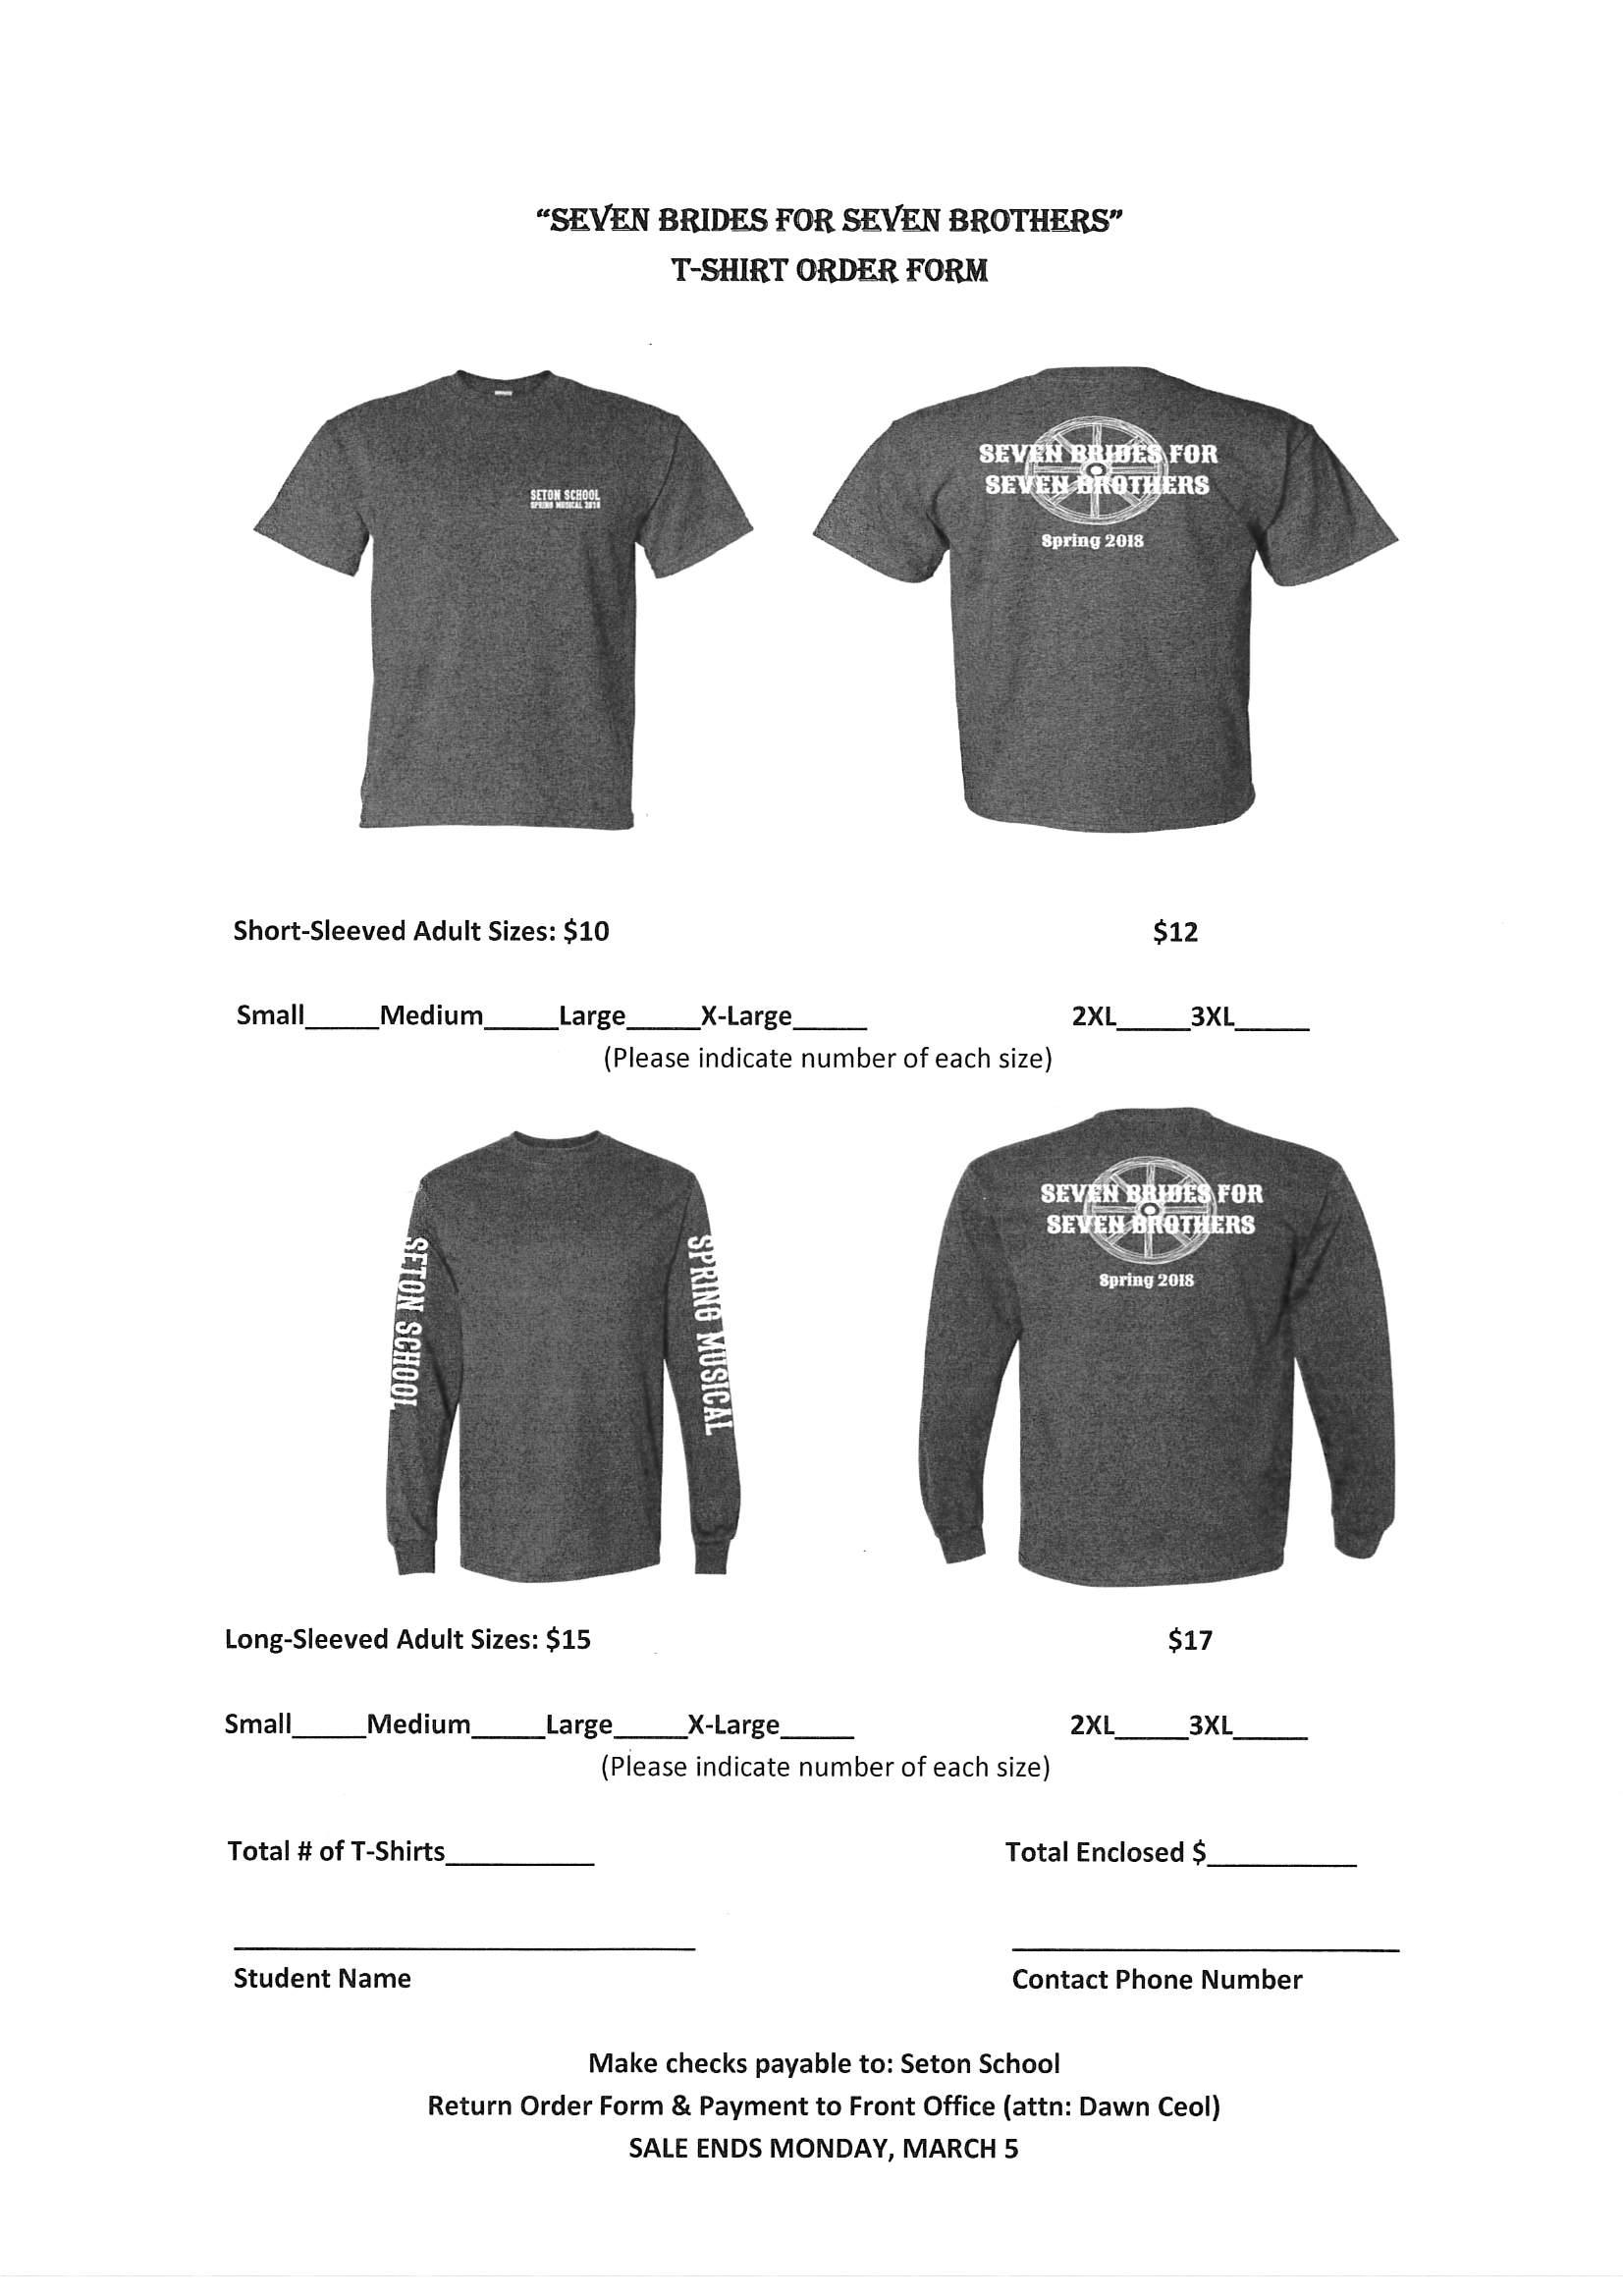 T Shirt Order Form | Musical T Shirt Order Form Final Seton School Manassas